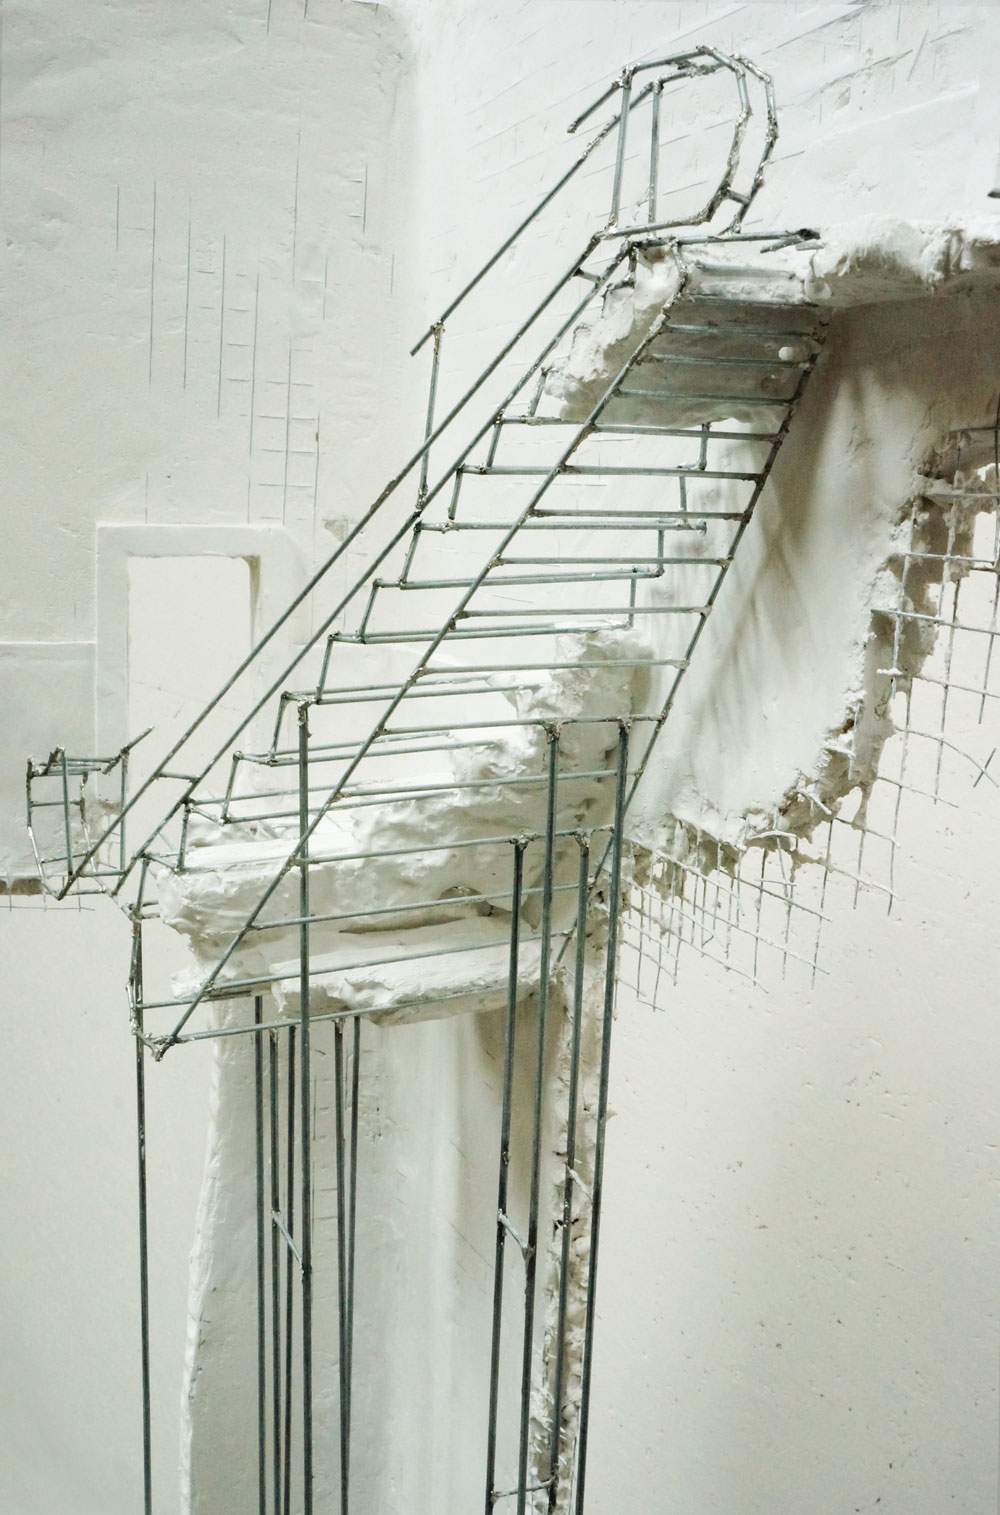 Verdieping-trap-onderkant